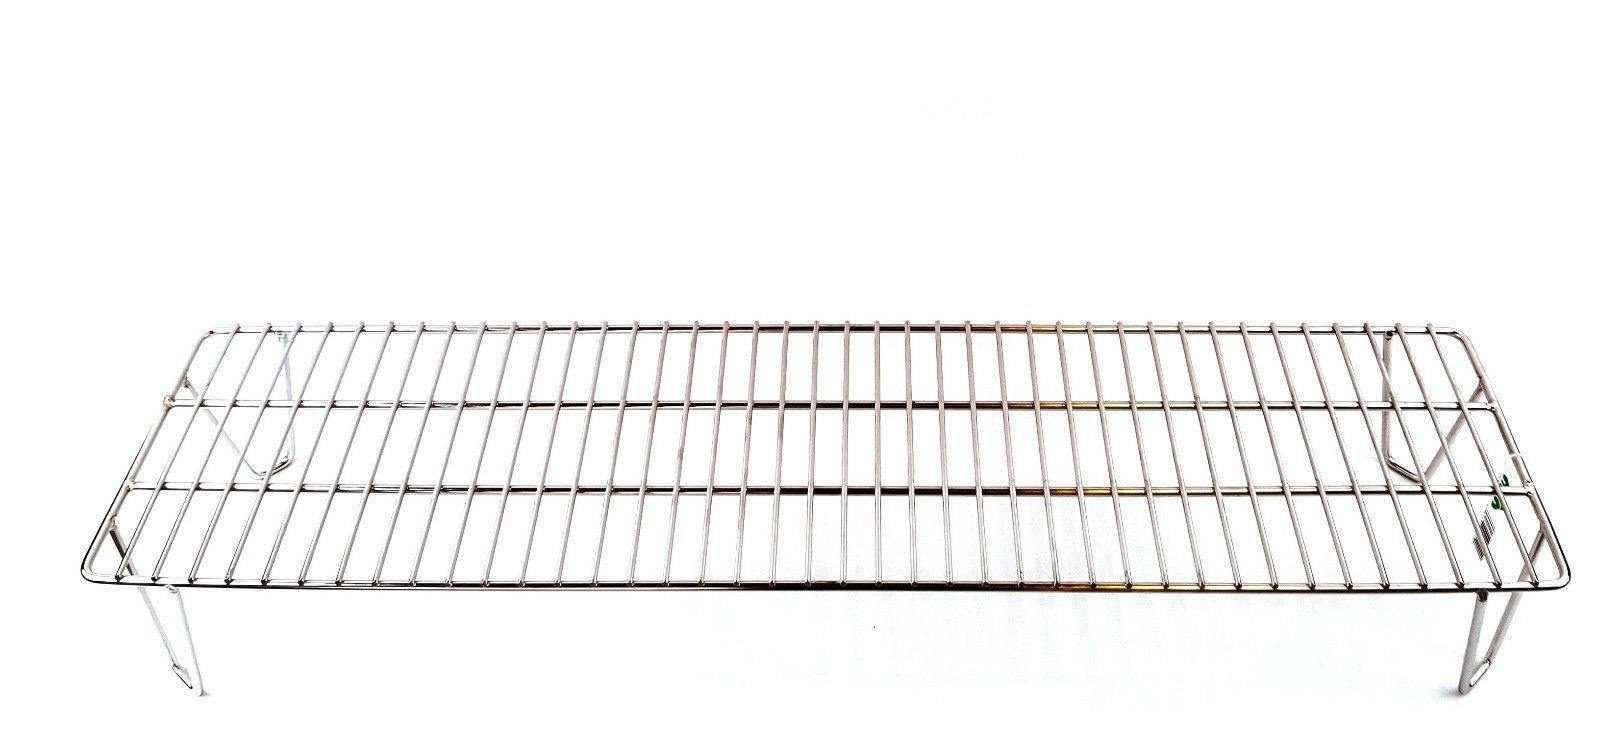 gmg upper rack jim bowie gmg 6006